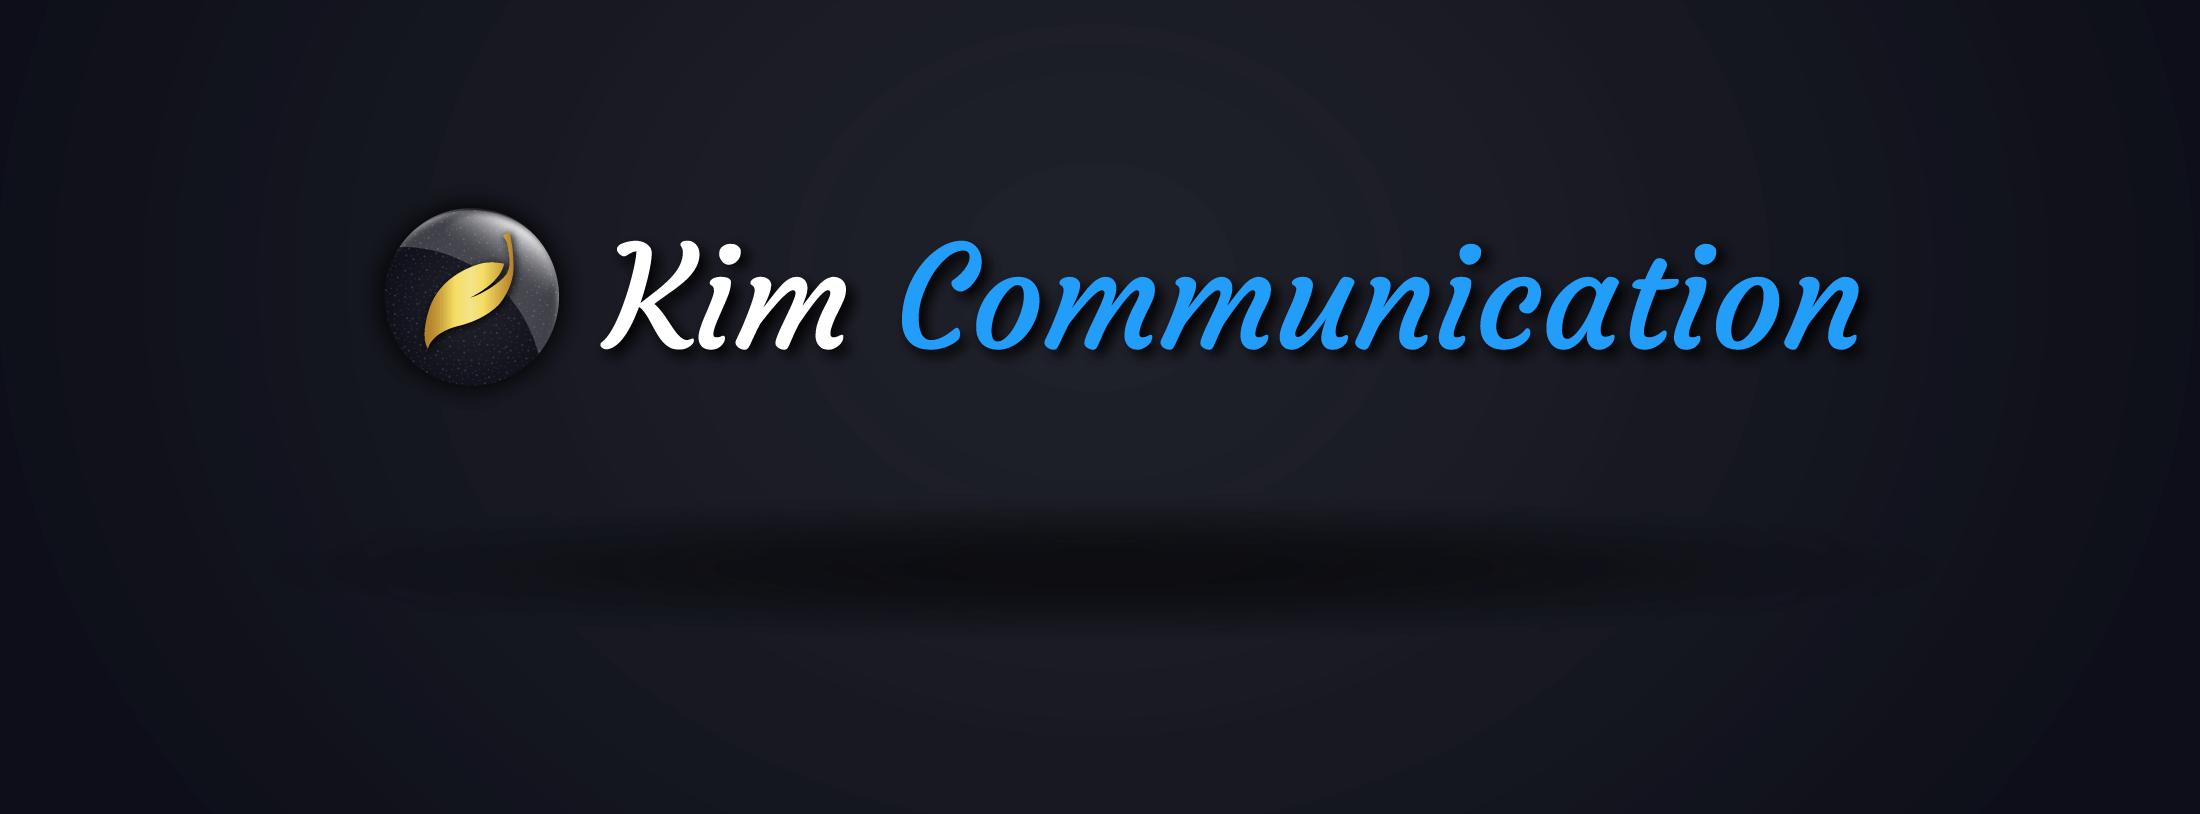 Kim Communication